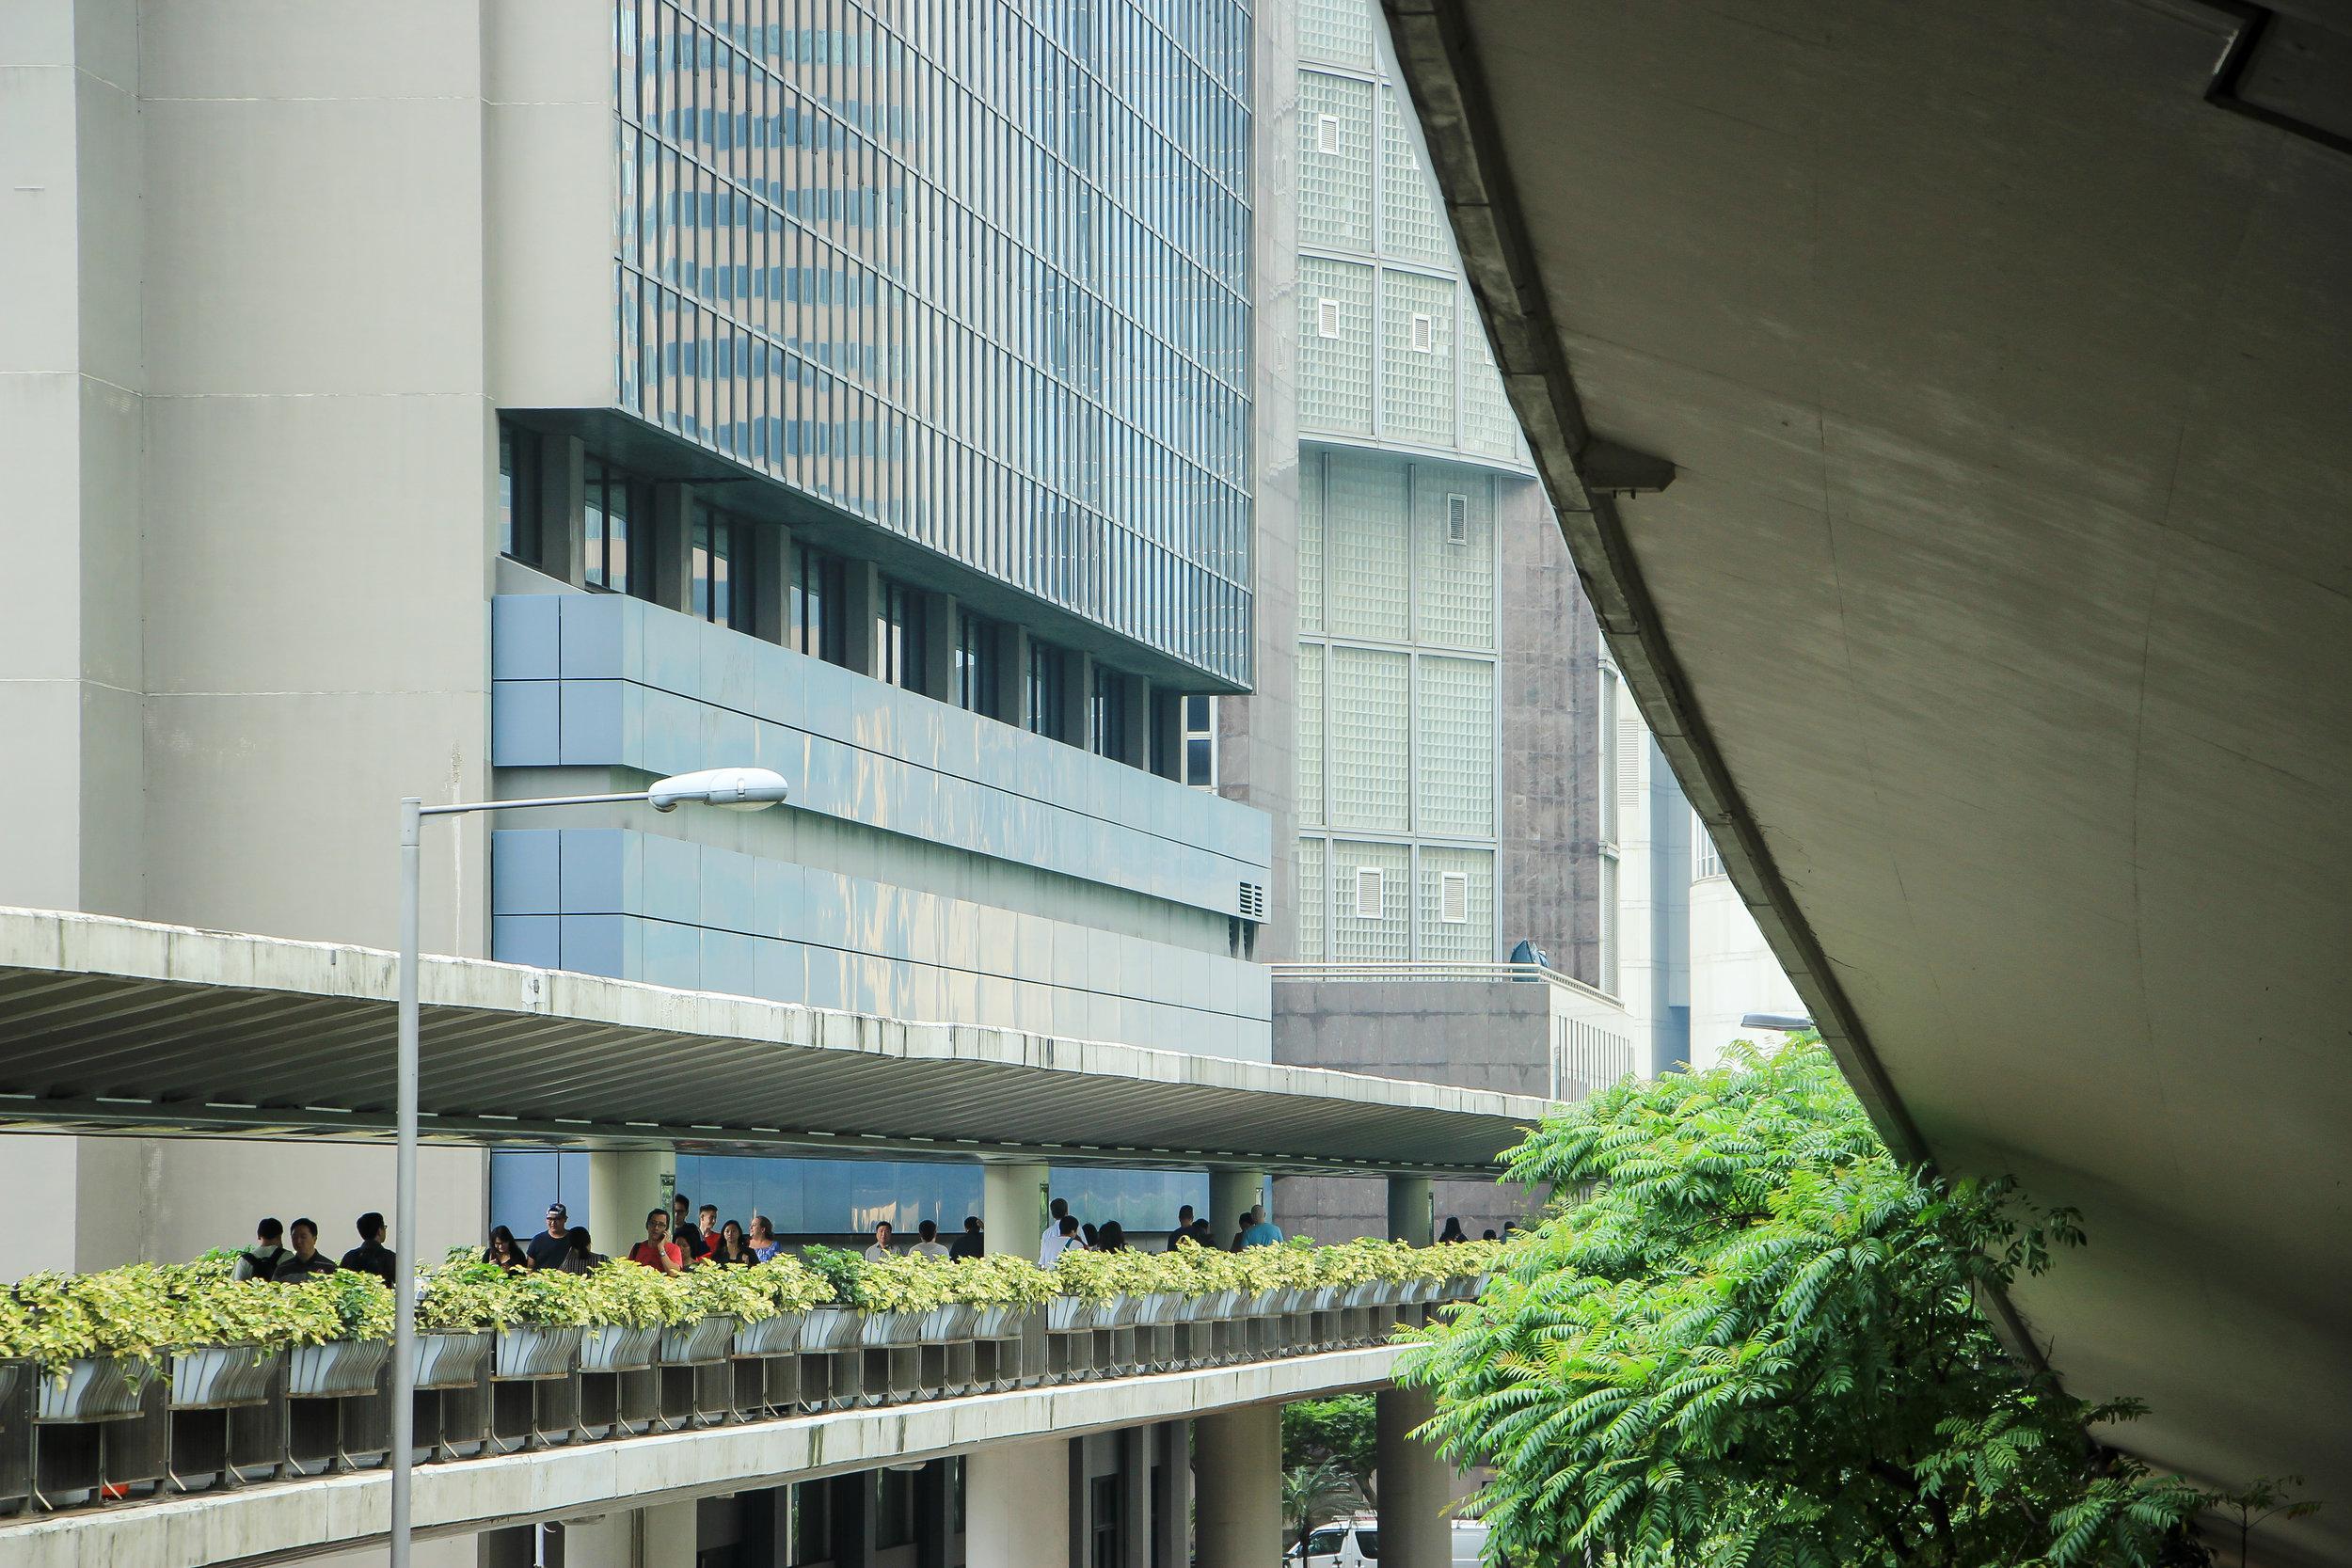 HONG KONG, HONG KONG ISLAND, street photography, ARCHITECTURE, people, MINIMAL, ASIA | DOLESSGETMOREDONE.COM |